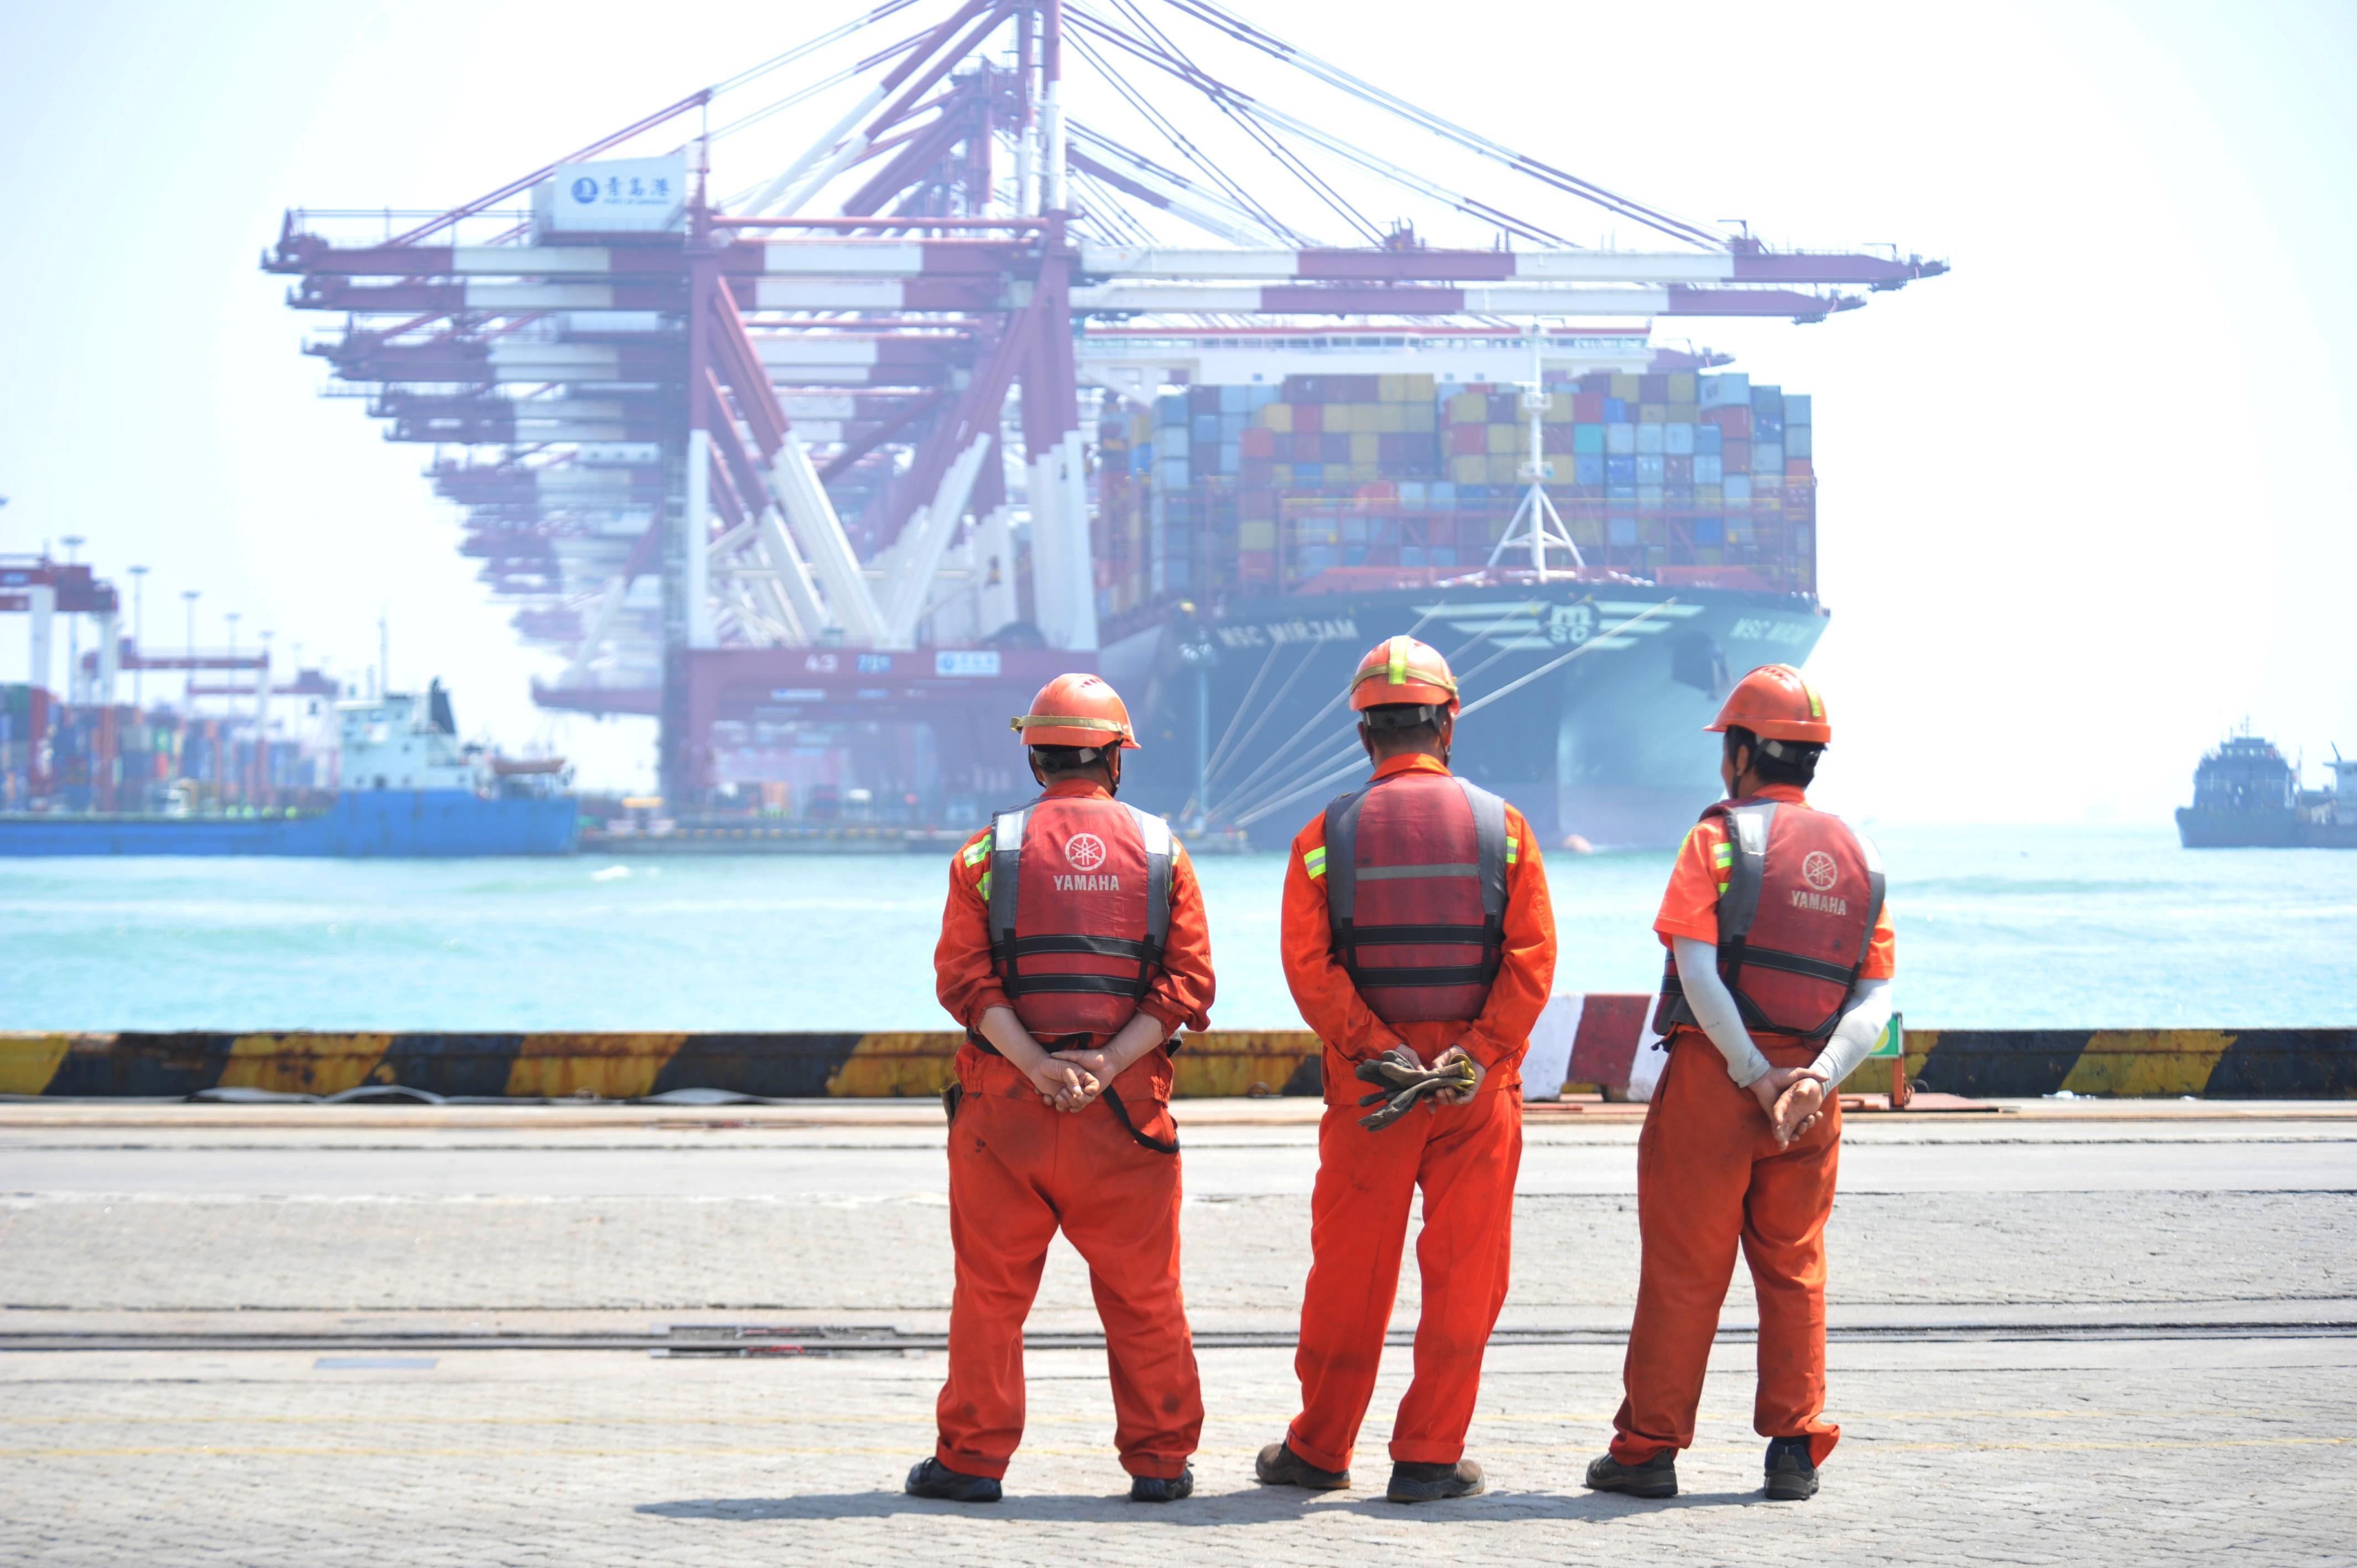 China's June exports, imports fall as trade war takes heavier toll